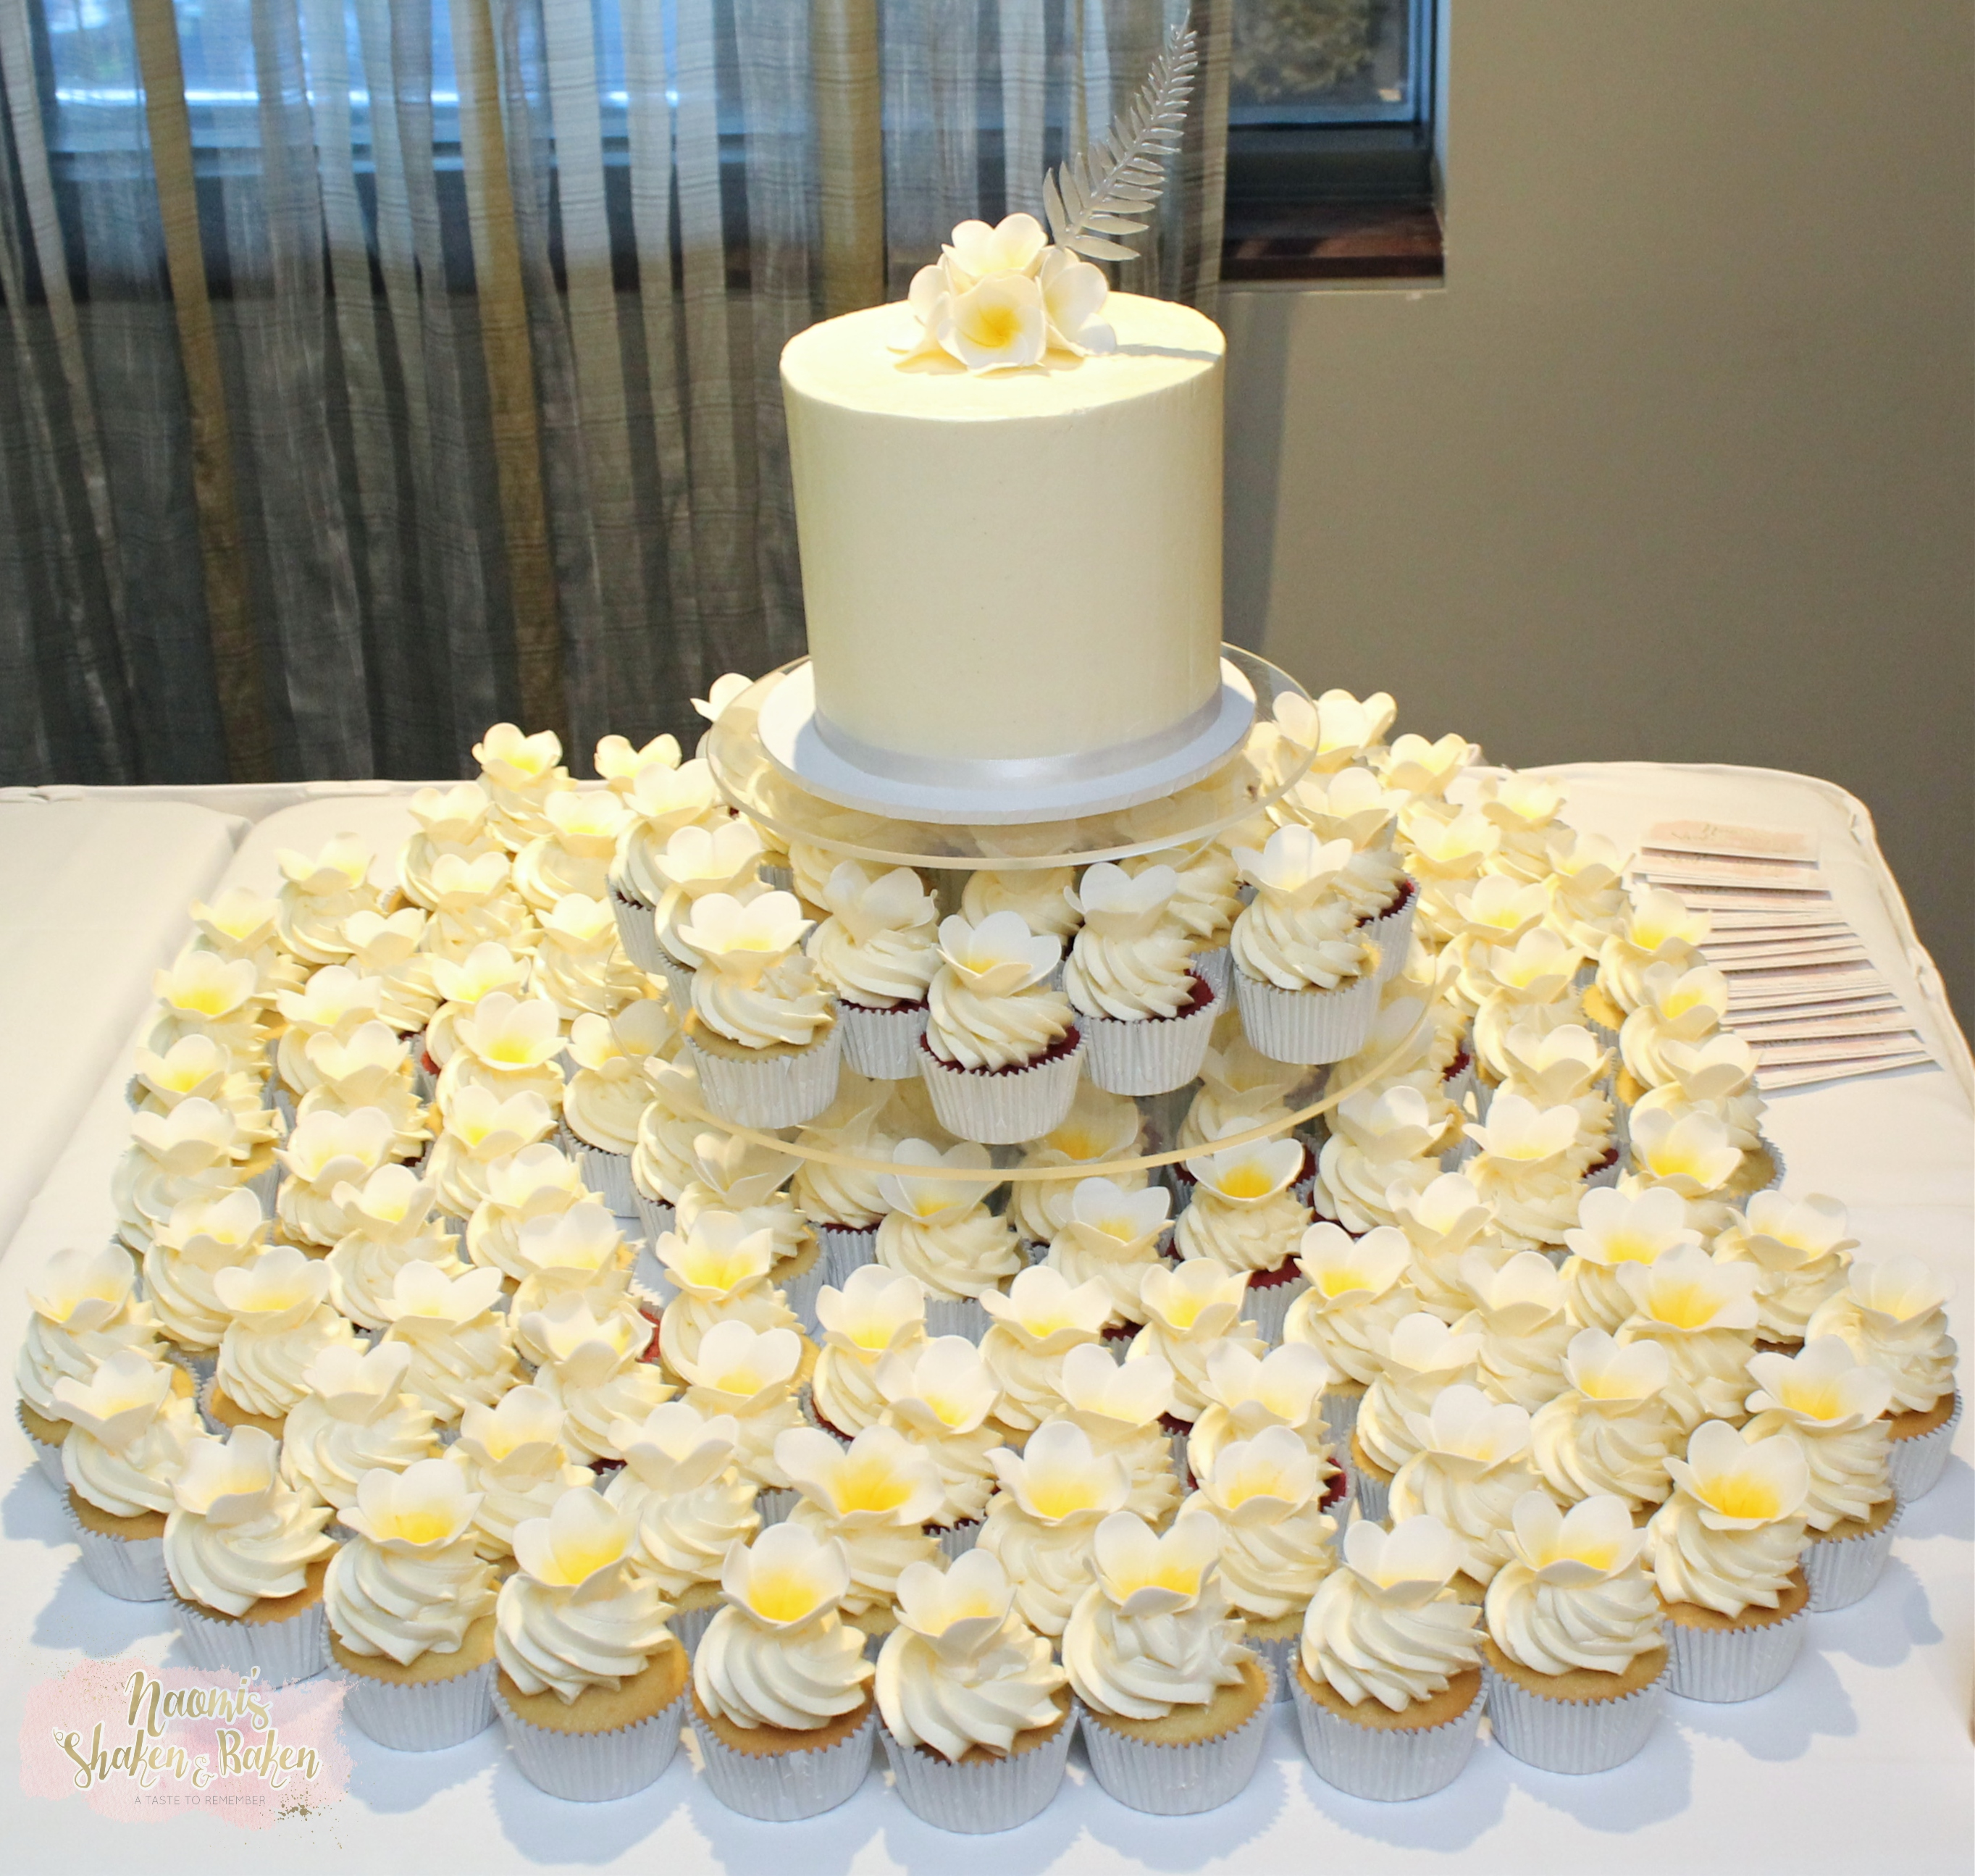 Cutting Cake & Cupcakes